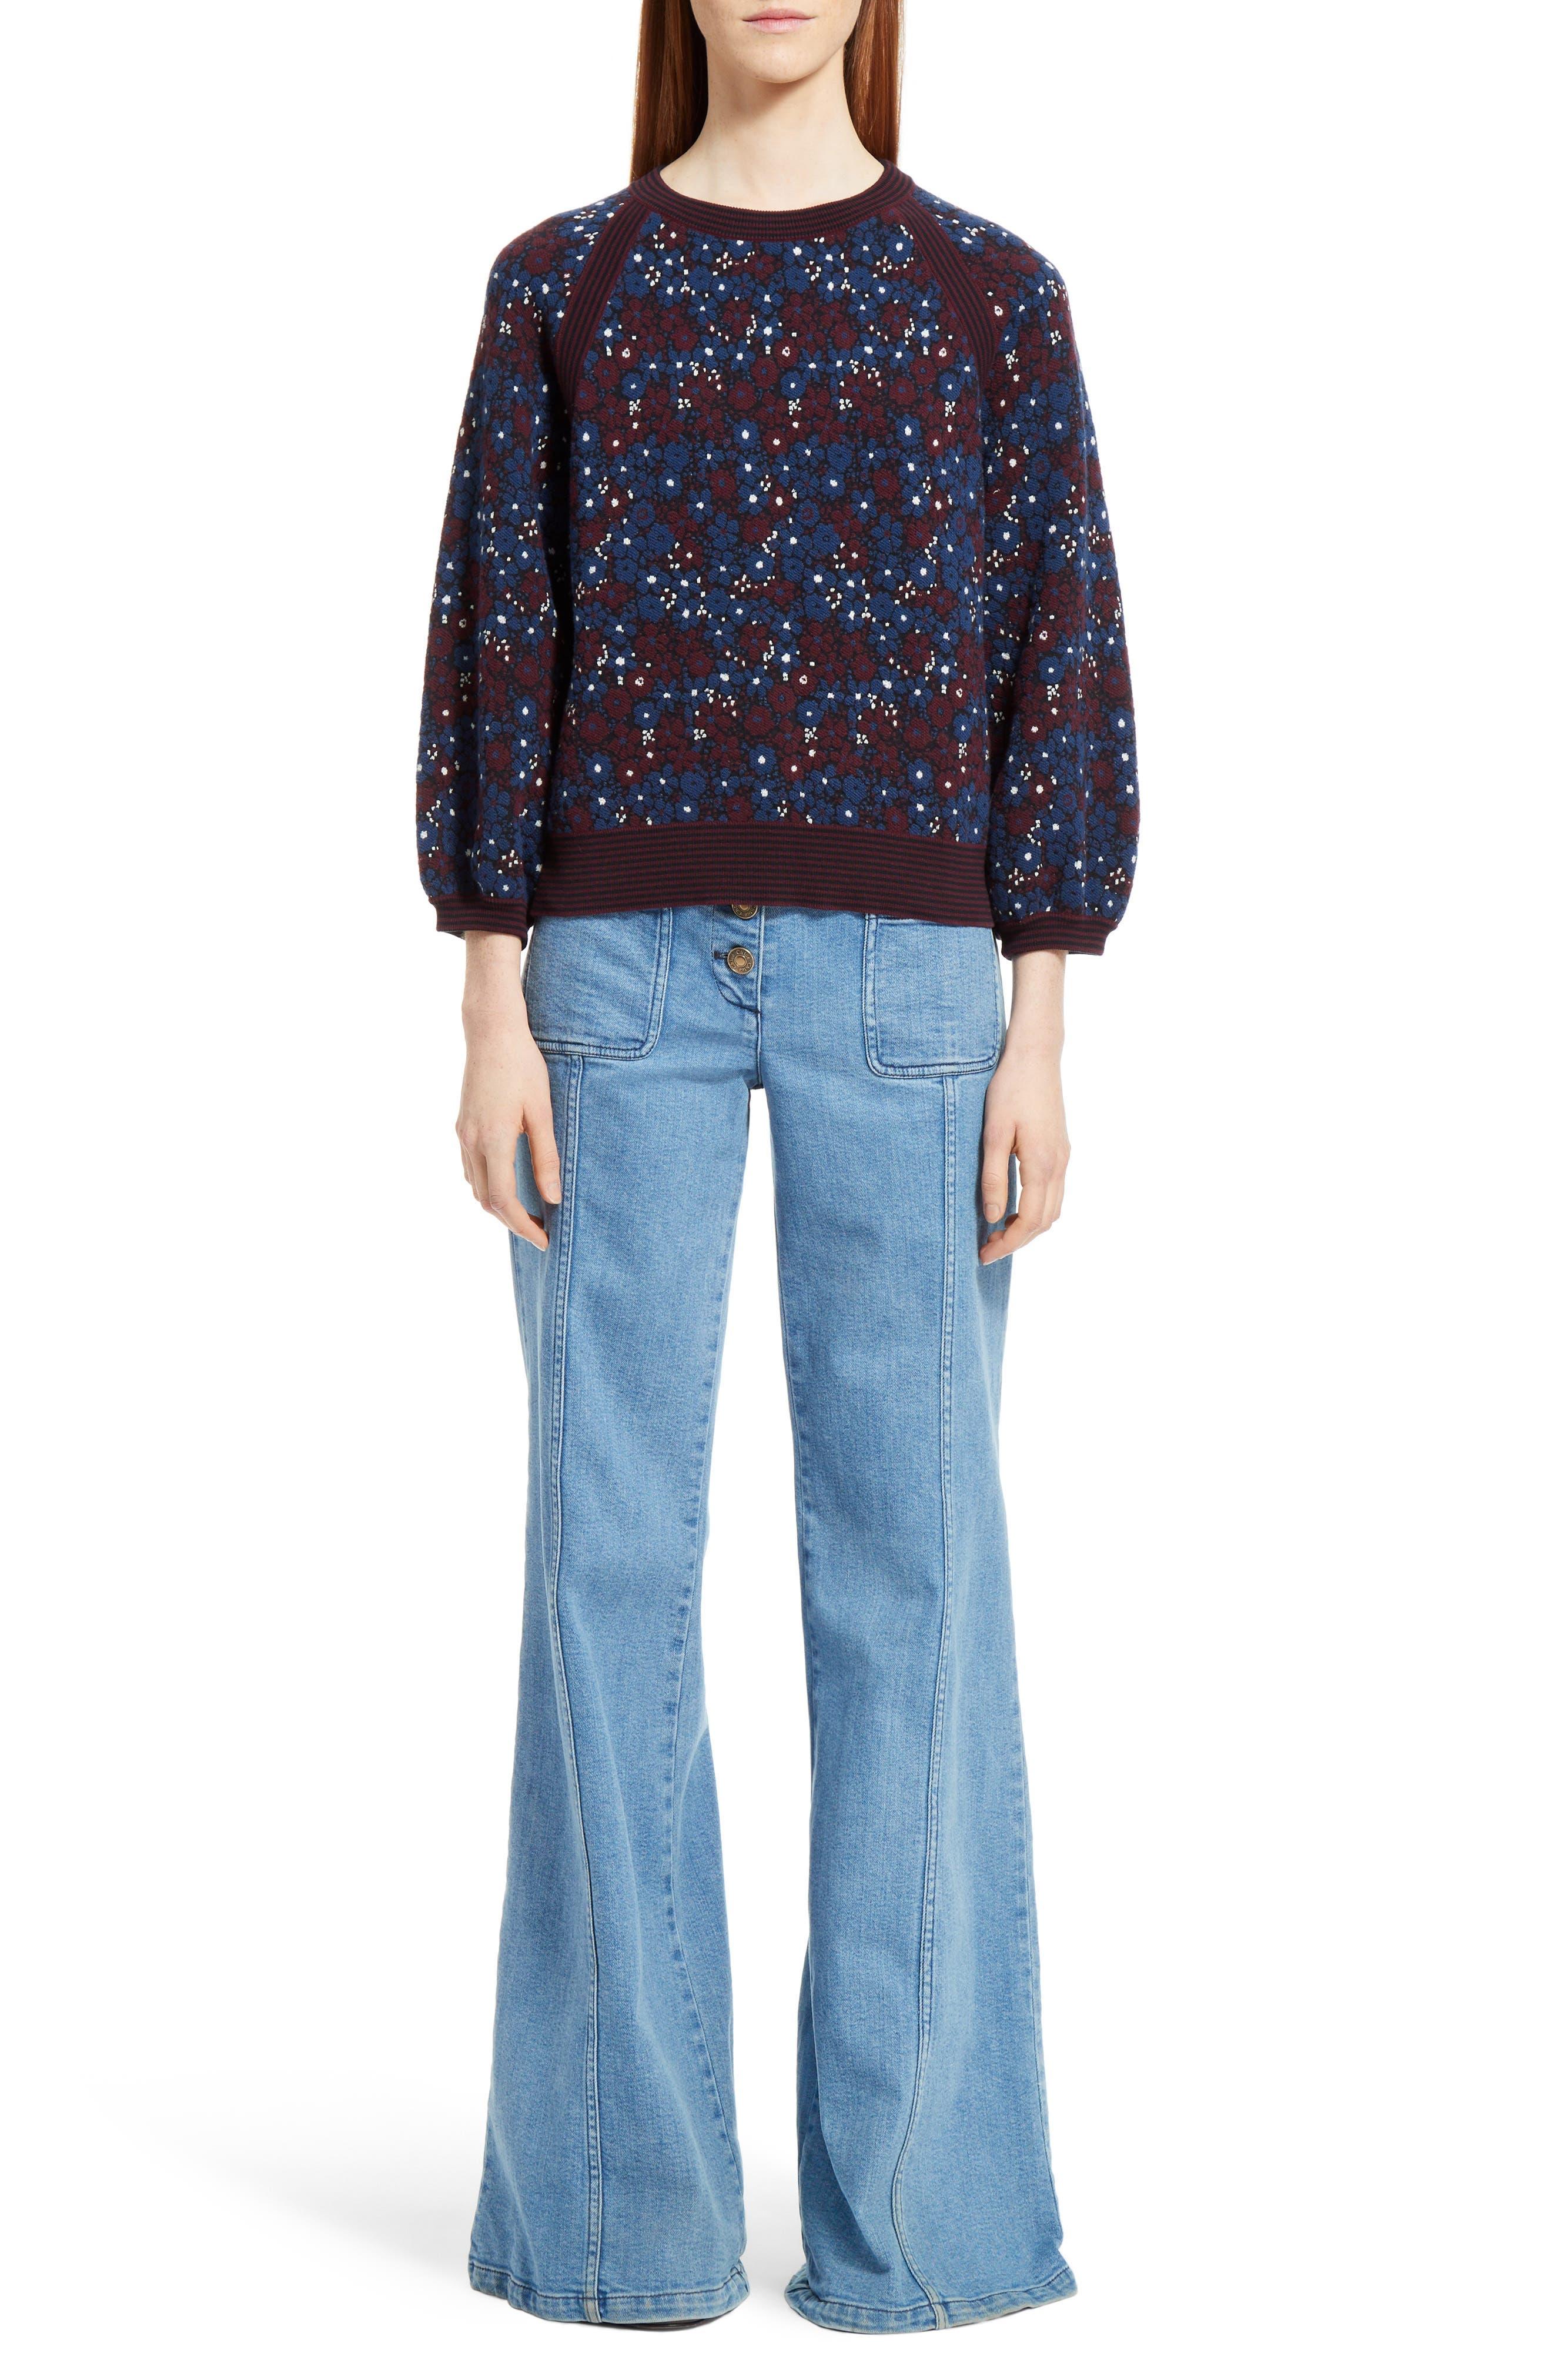 Main Image - Chloé Floral Jacquard Sweater